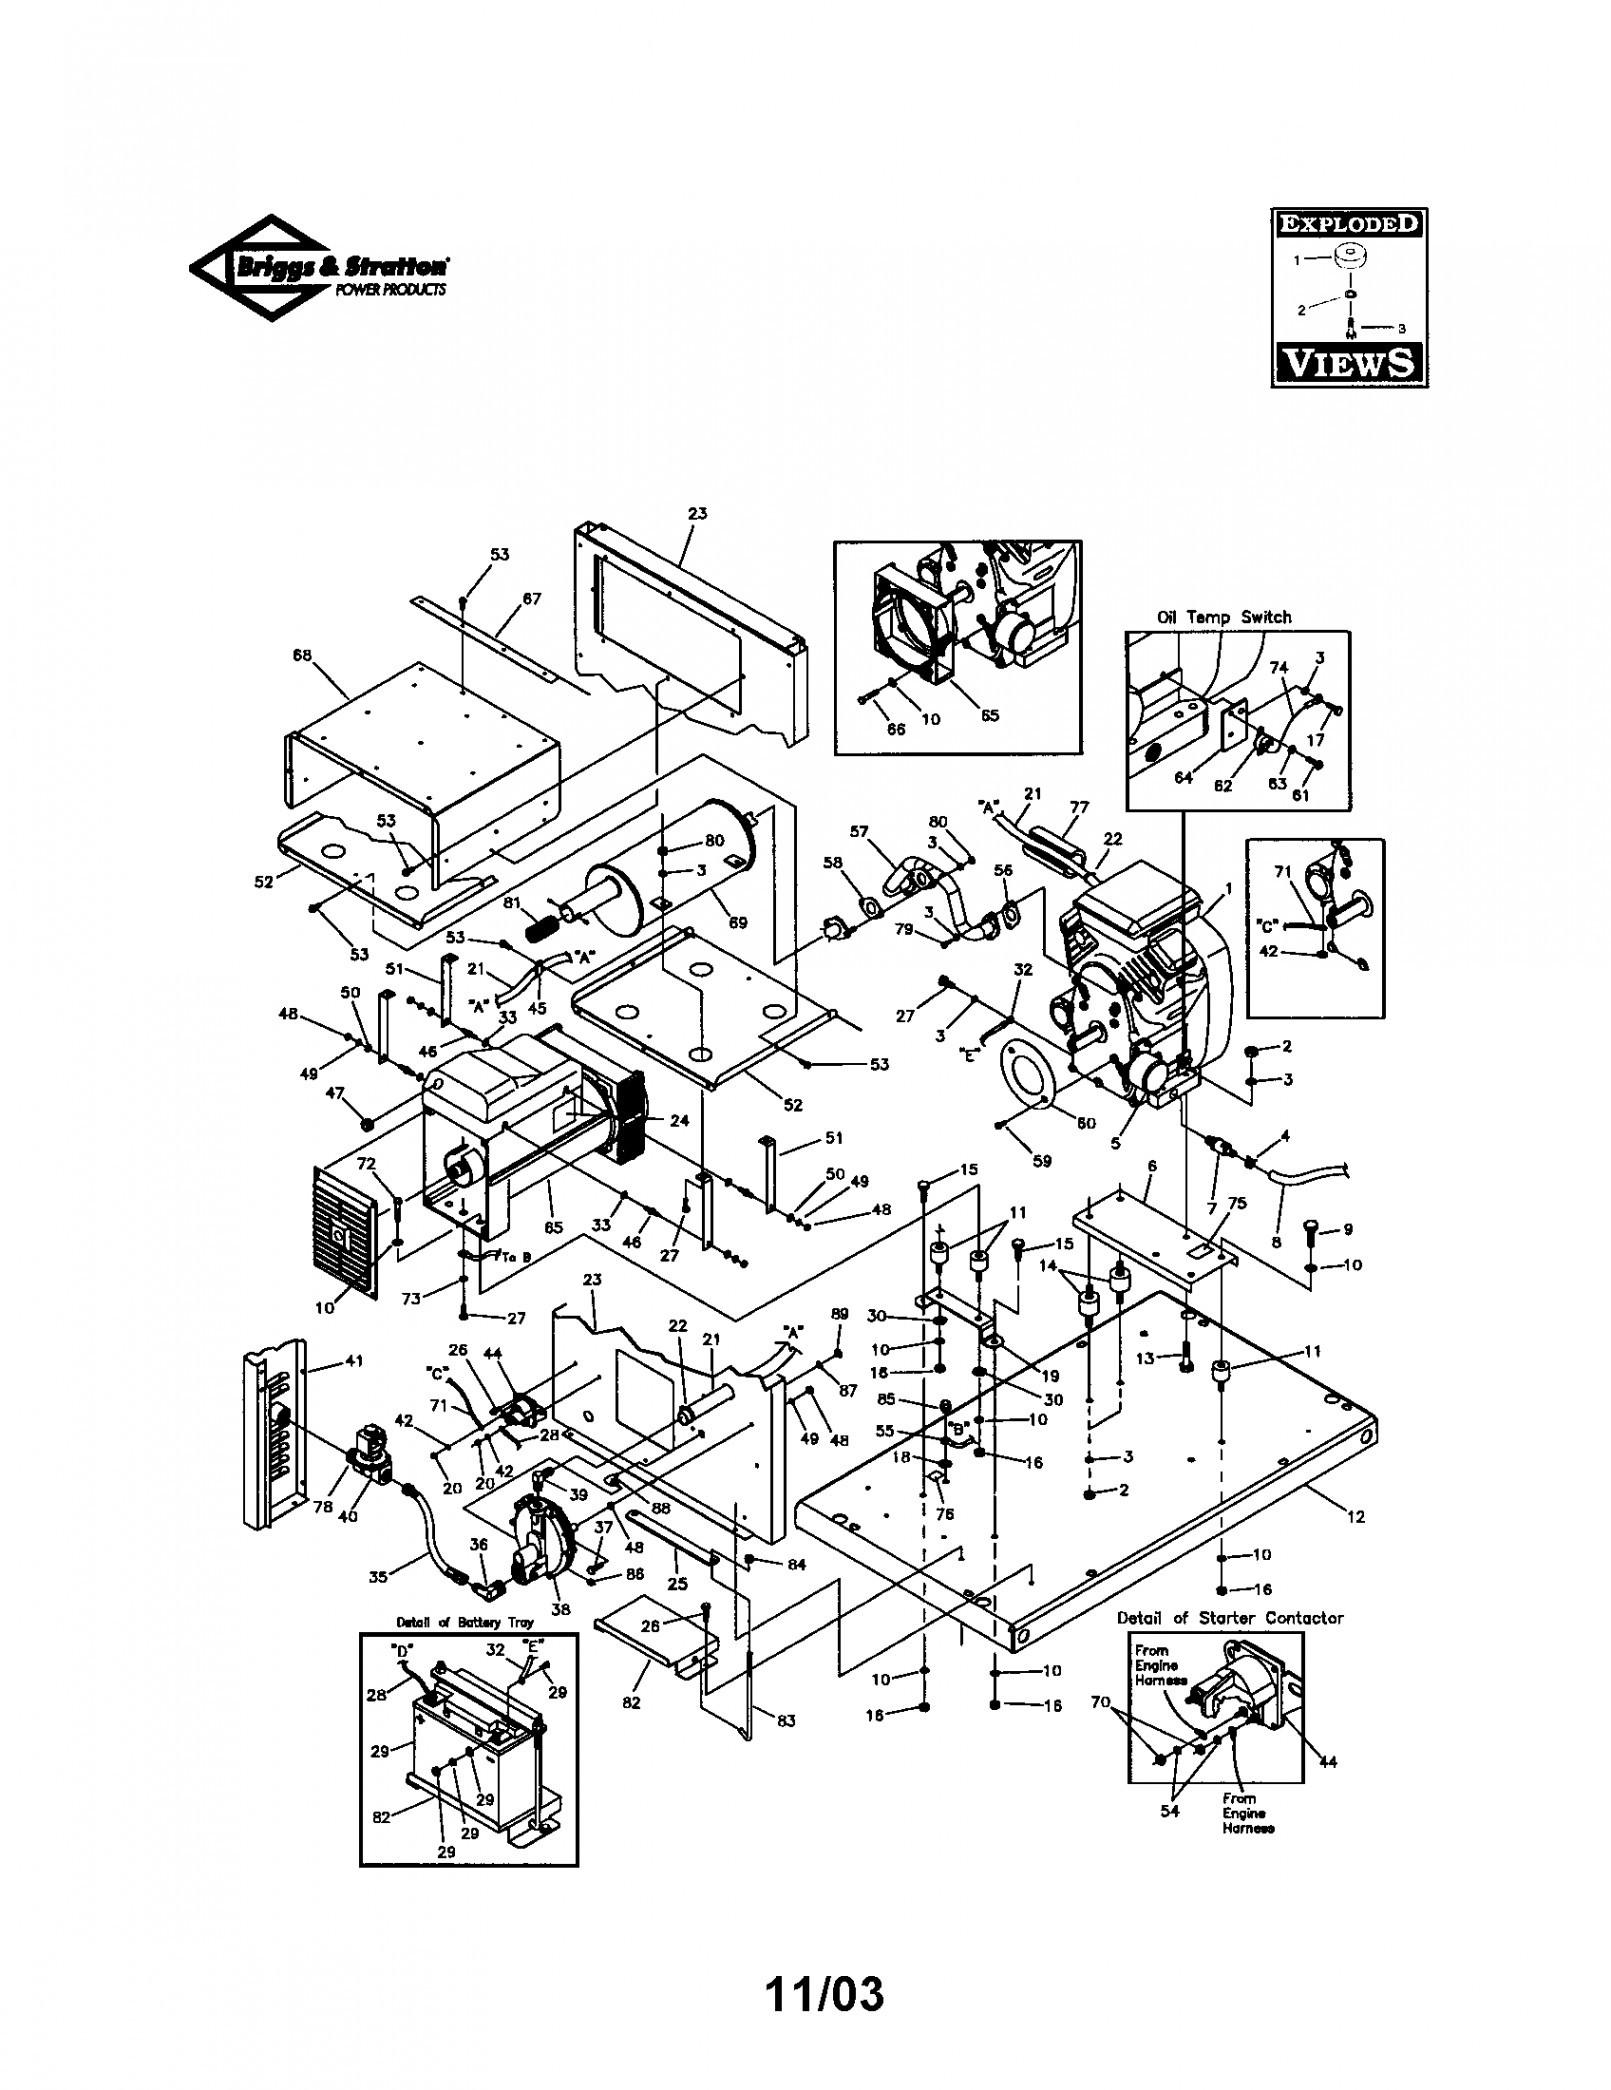 Briggs and Stratton Lawn Mower Parts Diagram Briggs and